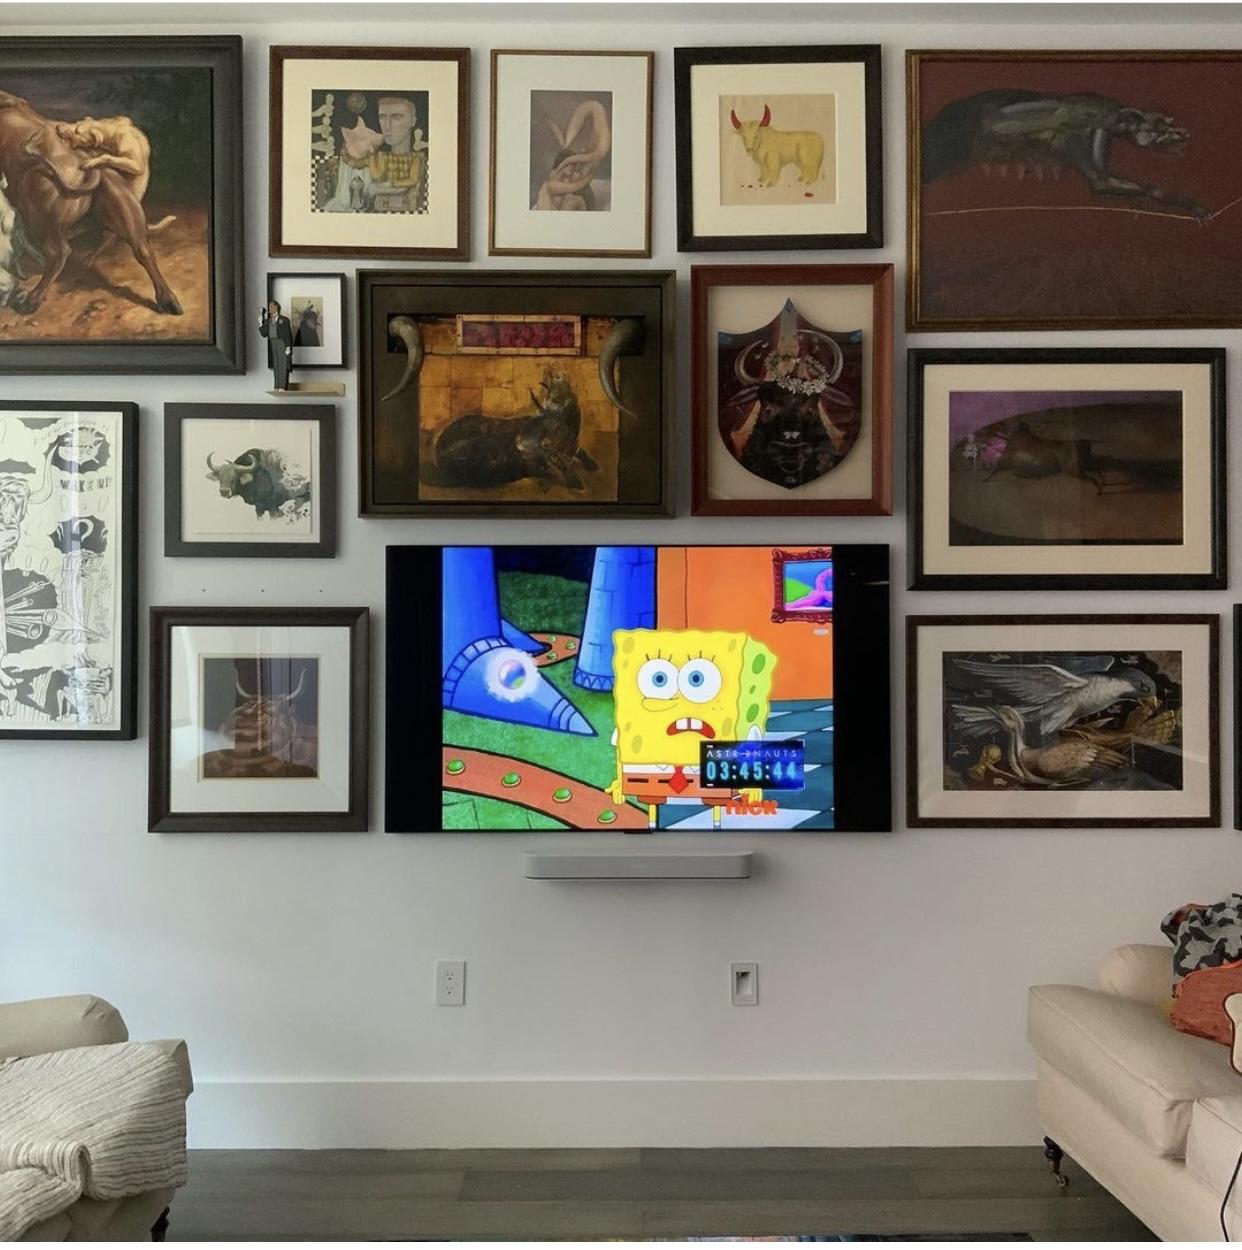 TV installation and surround sound system